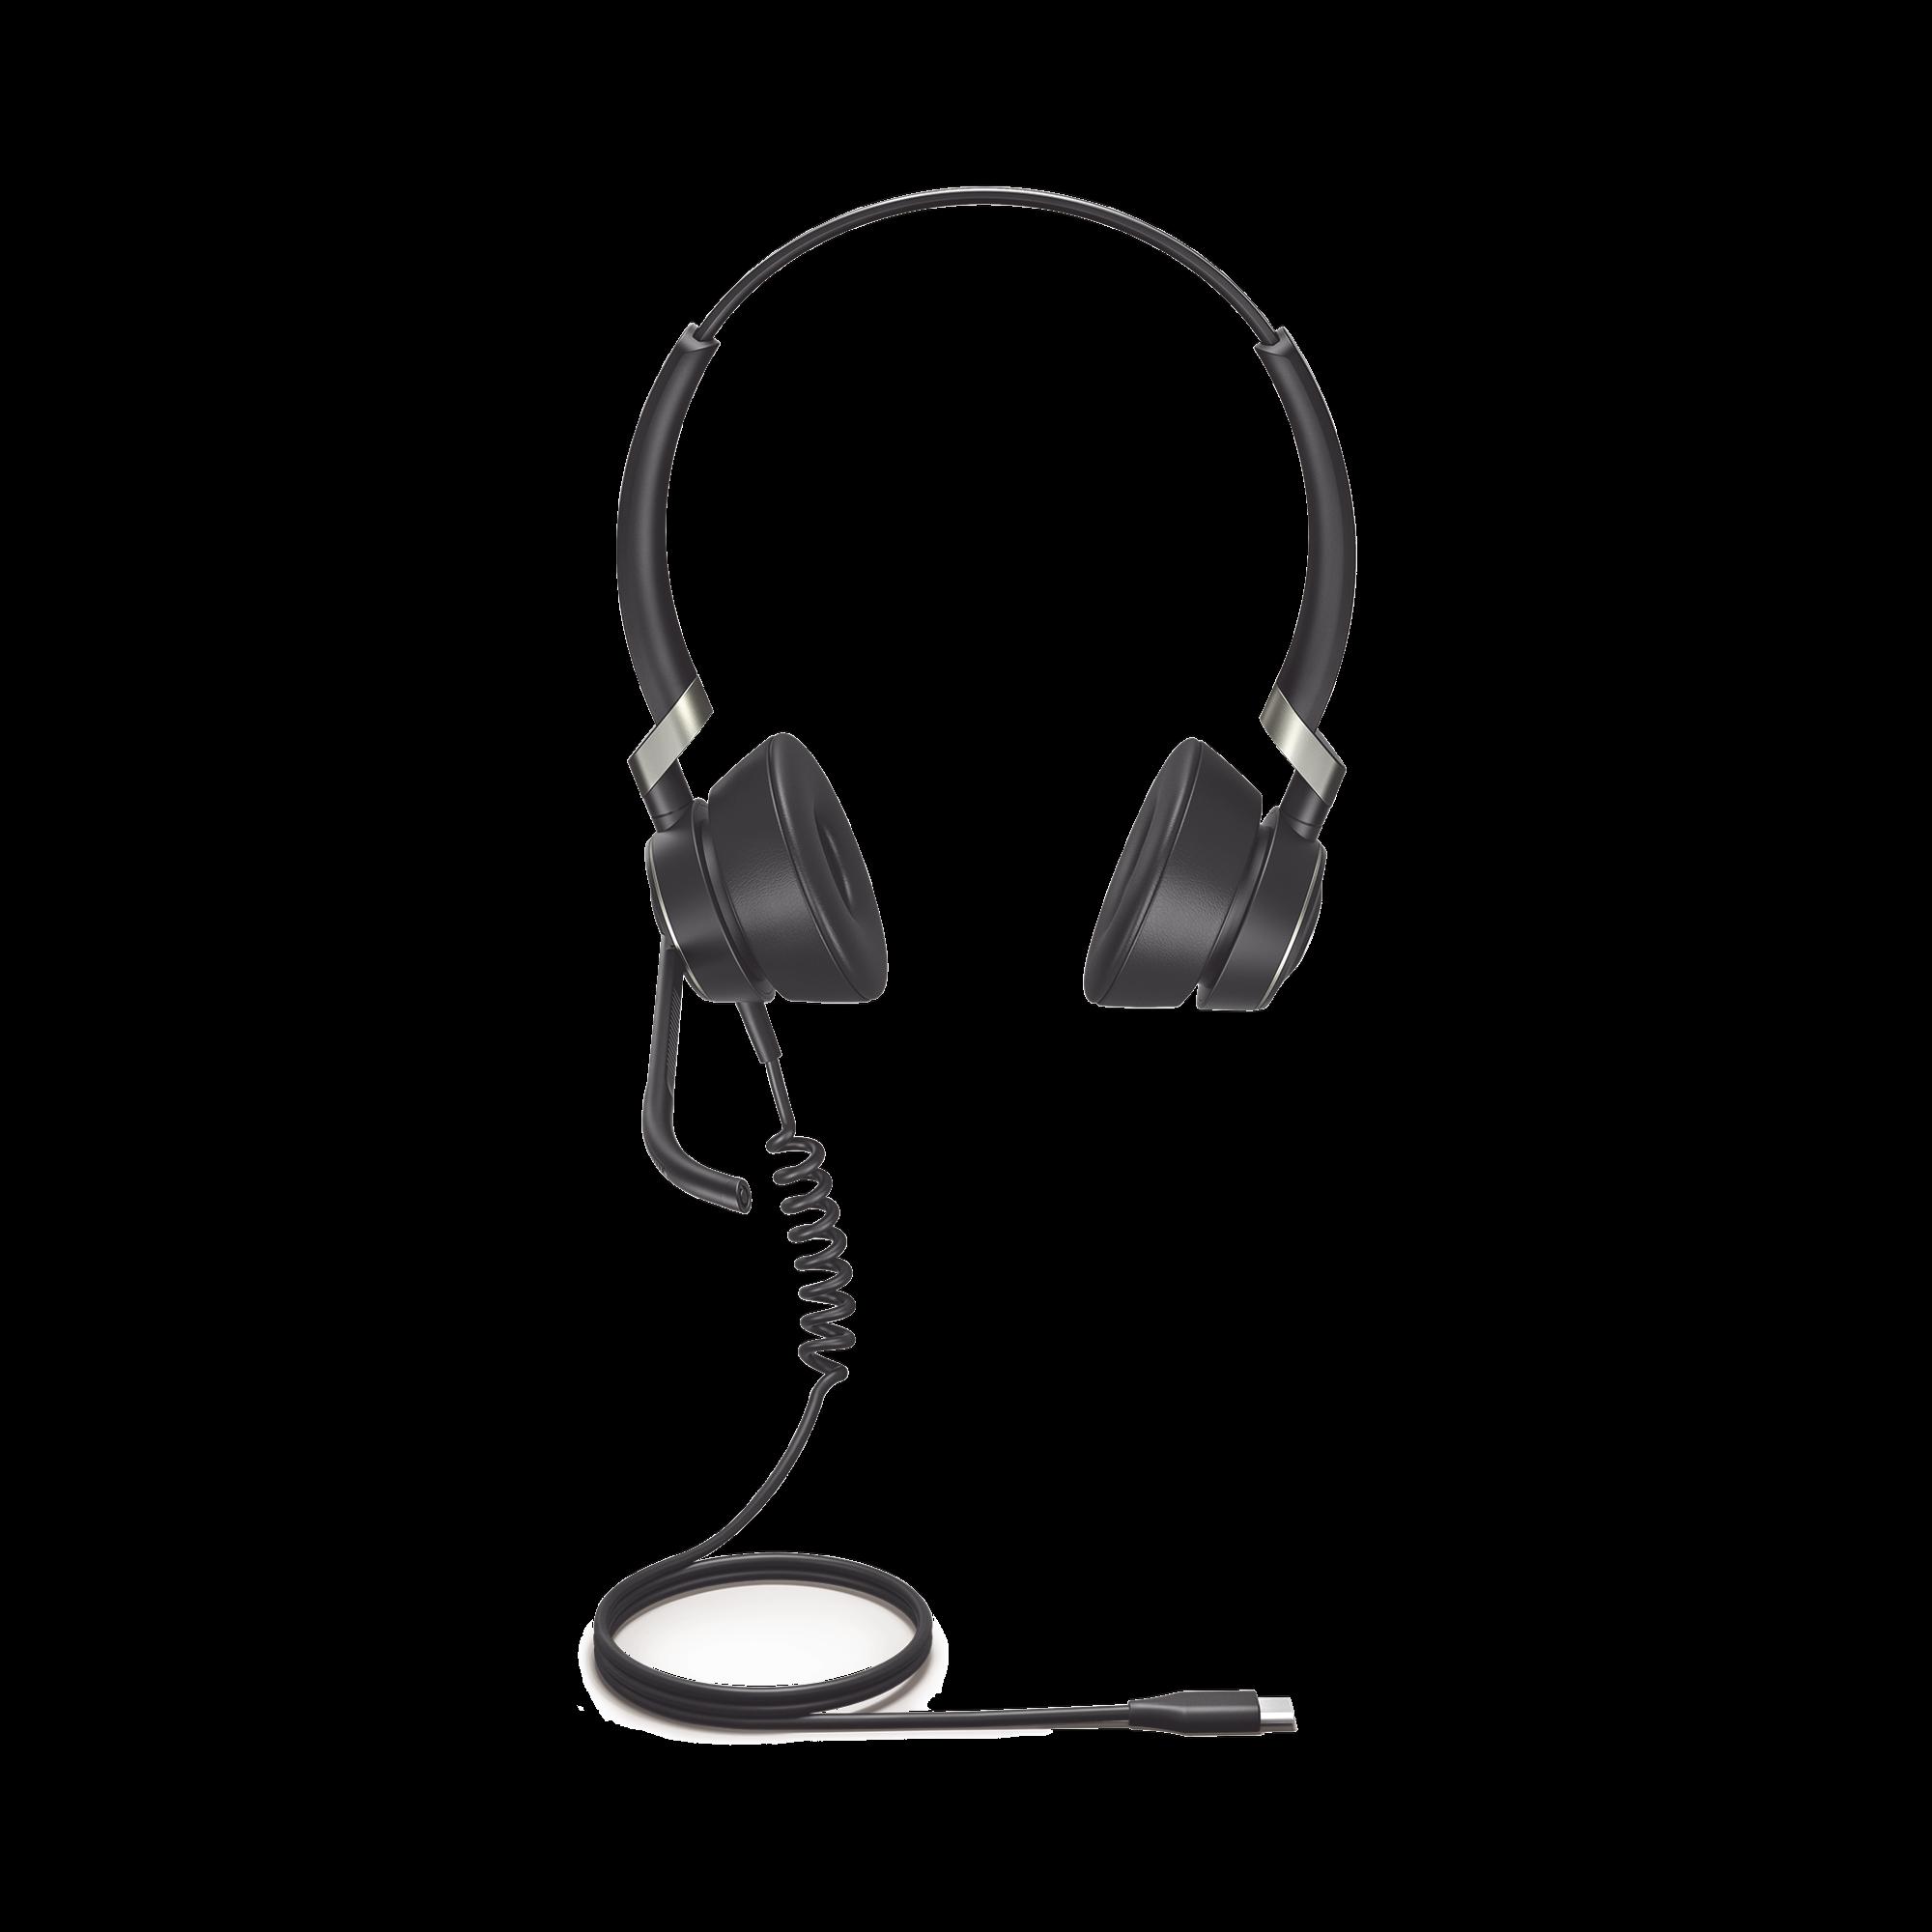 Jabra Engage 50 auricular profesional digital con conexion USB-C(5099-610-189)